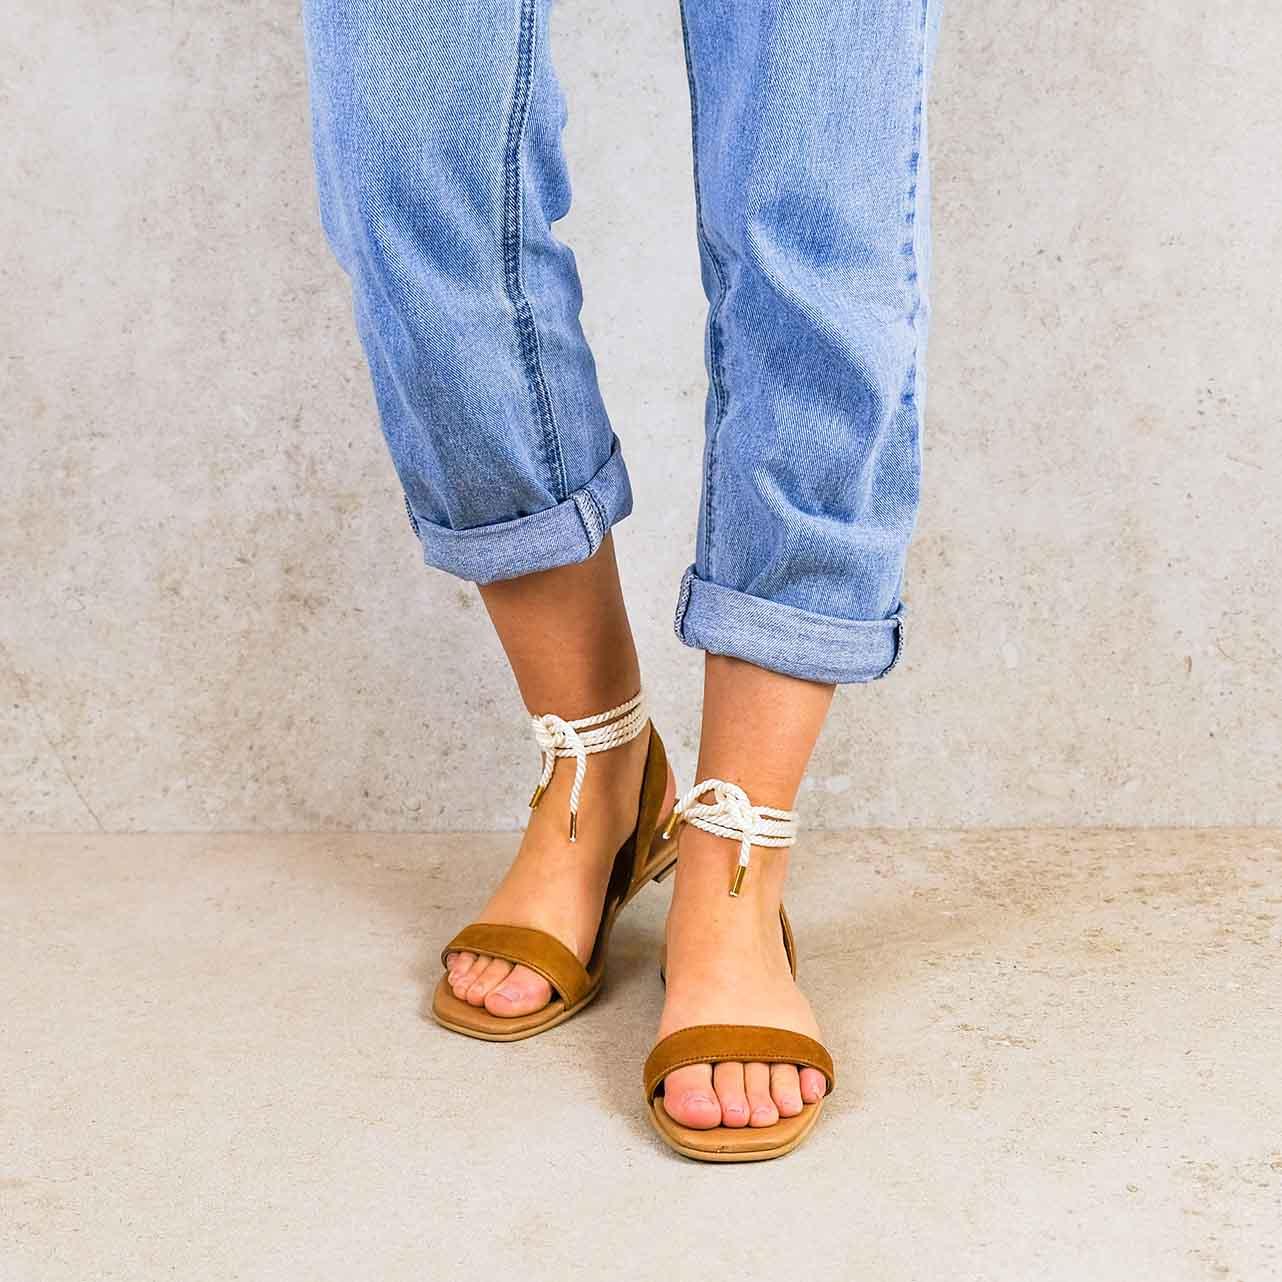 Candela-camel_lintsandalen sandals travelsandals vegan sustainable sandals wikkelsandalen